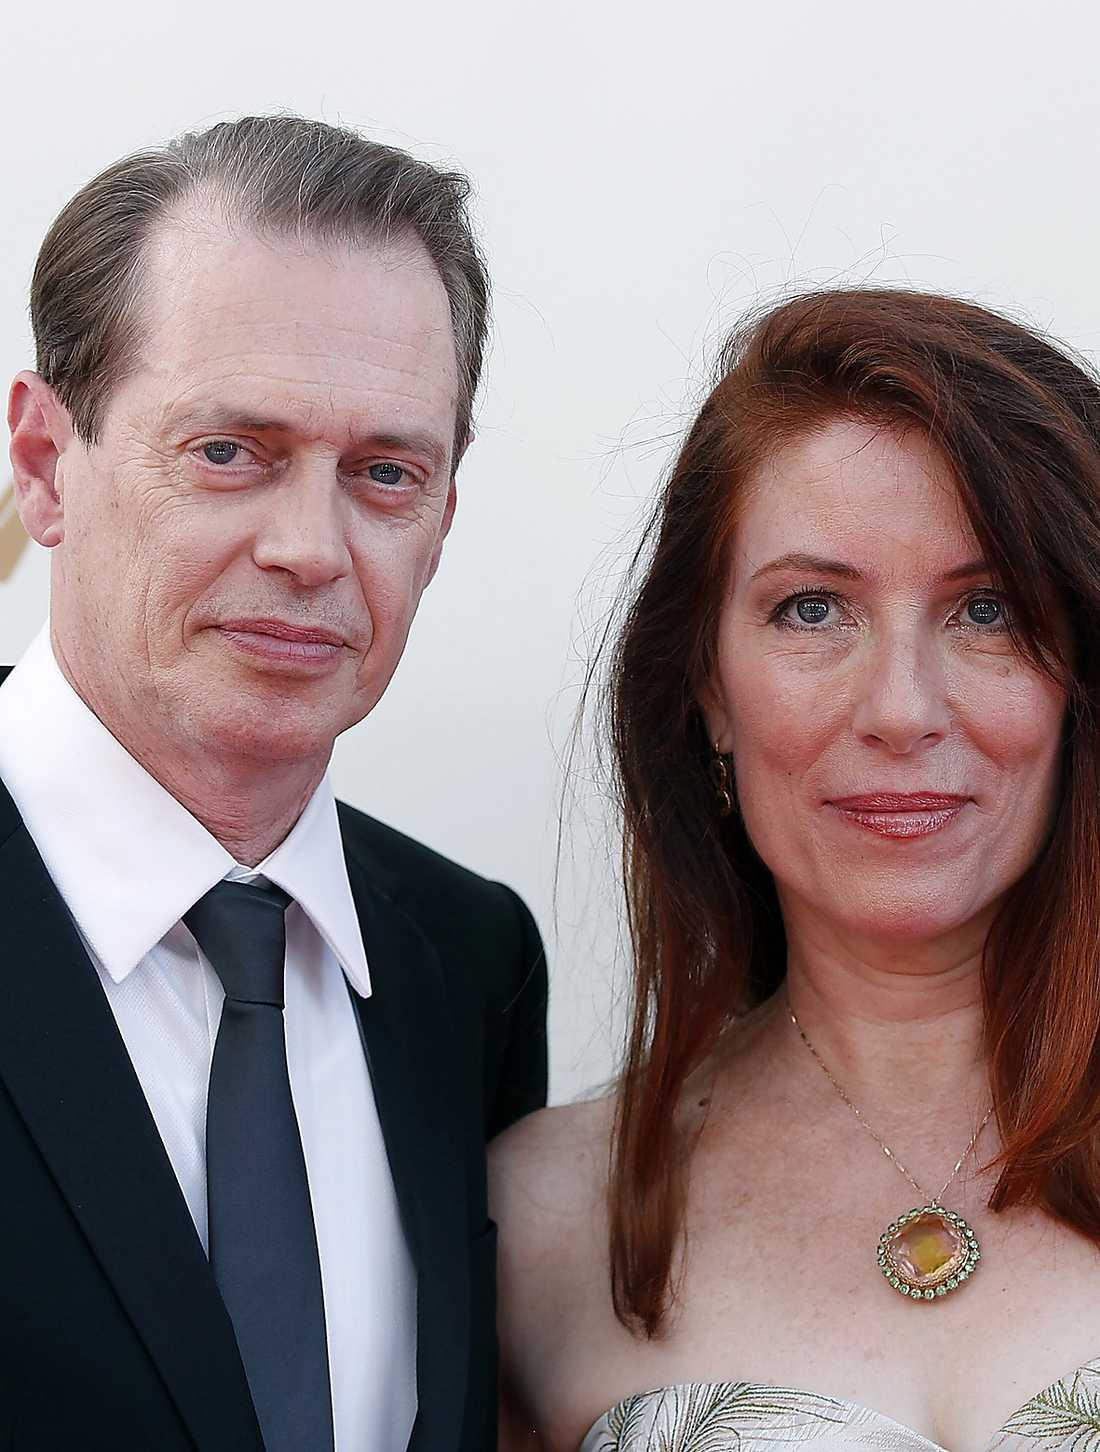 Steve Buscemi med hustru.